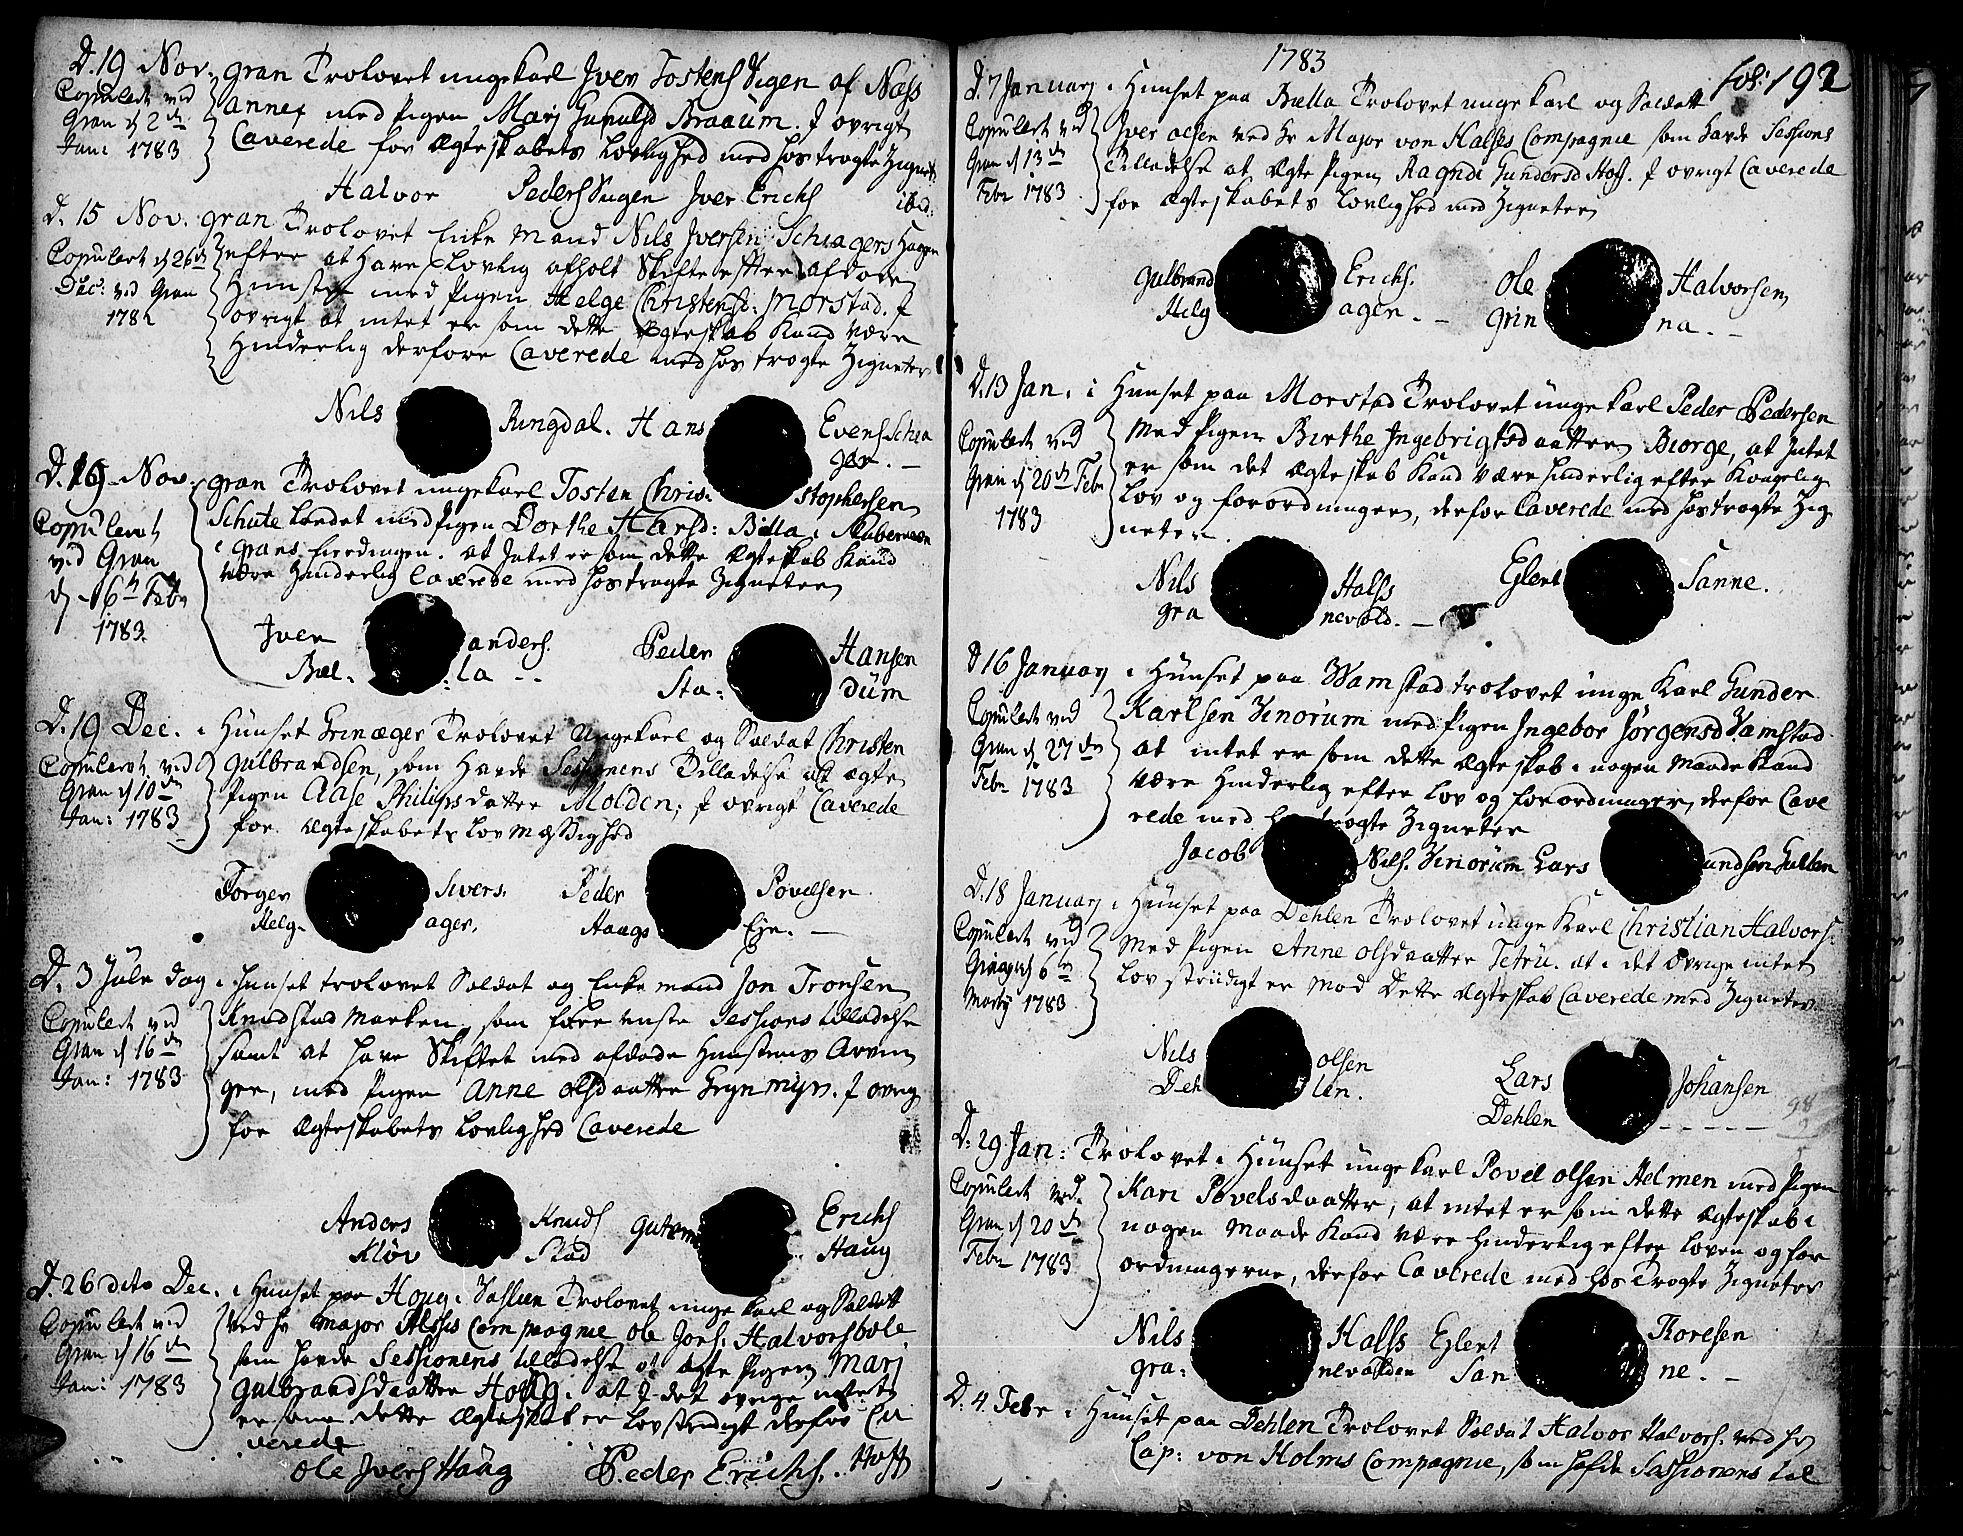 SAH, Gran prestekontor, Ministerialbok nr. 5, 1776-1788, s. 192